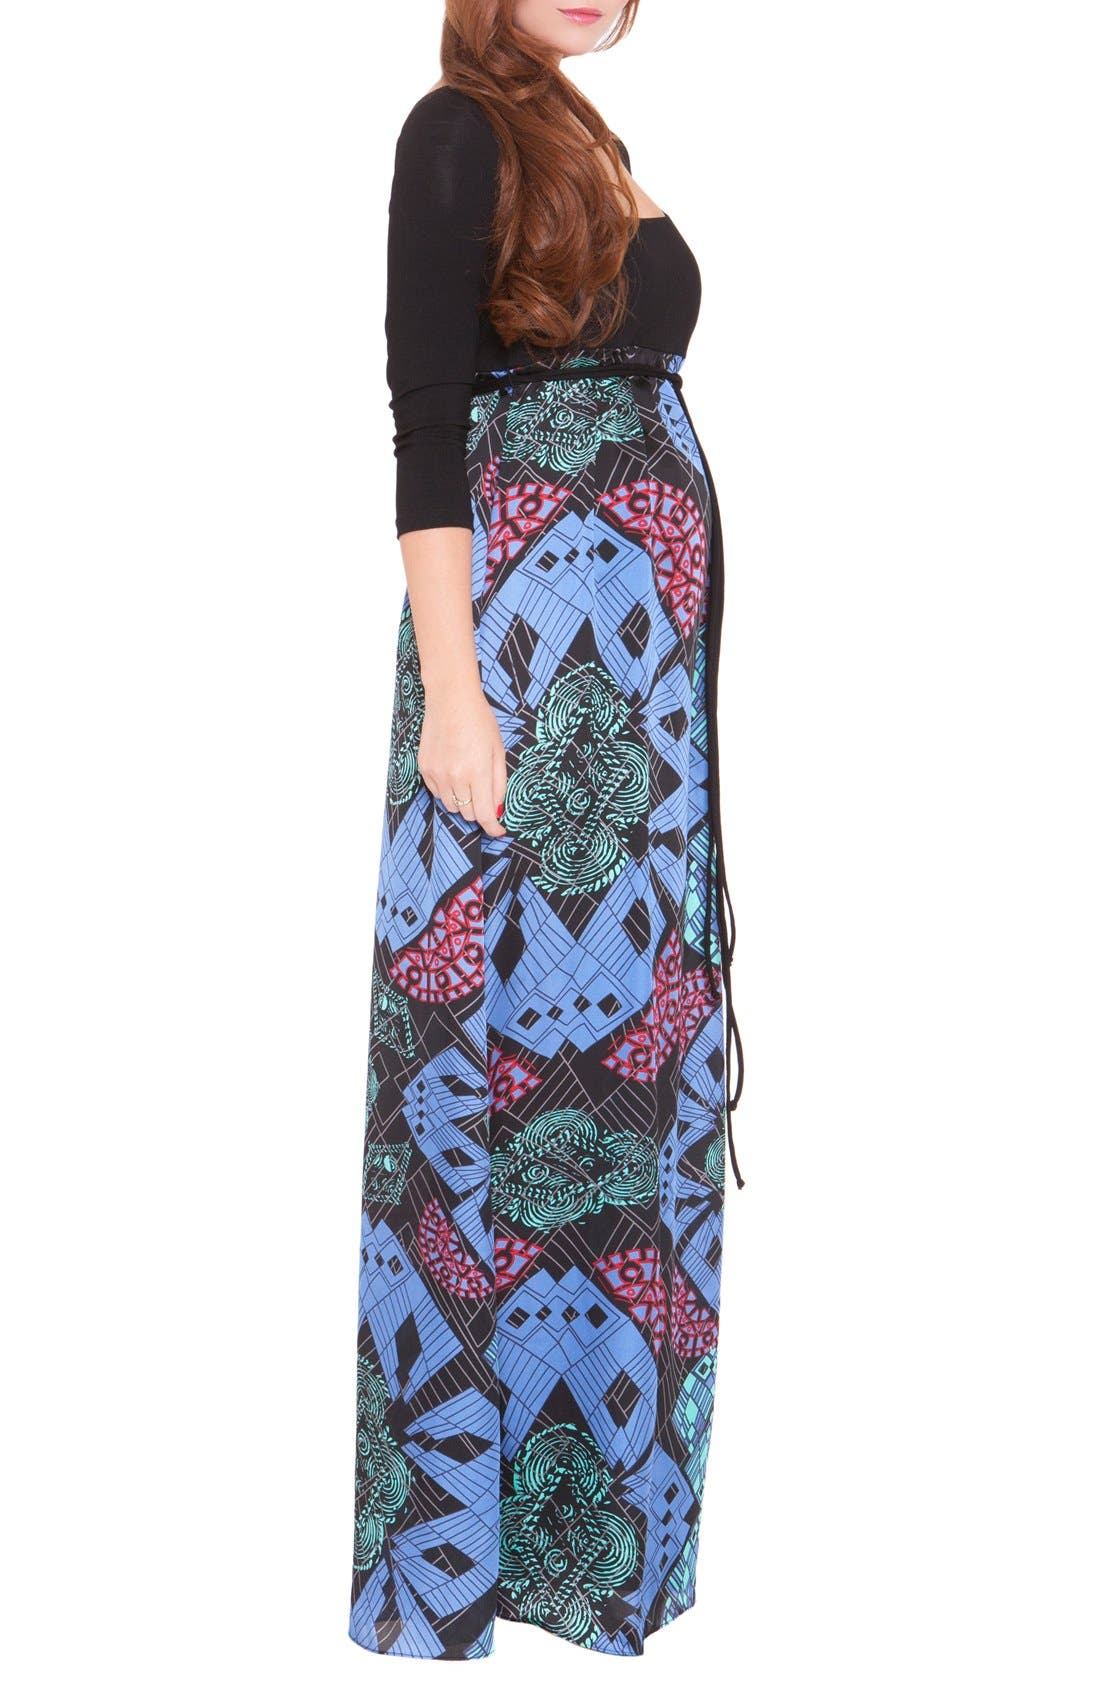 'Samantha' Maternity Maxi Dress,                             Alternate thumbnail 2, color,                             BLUE